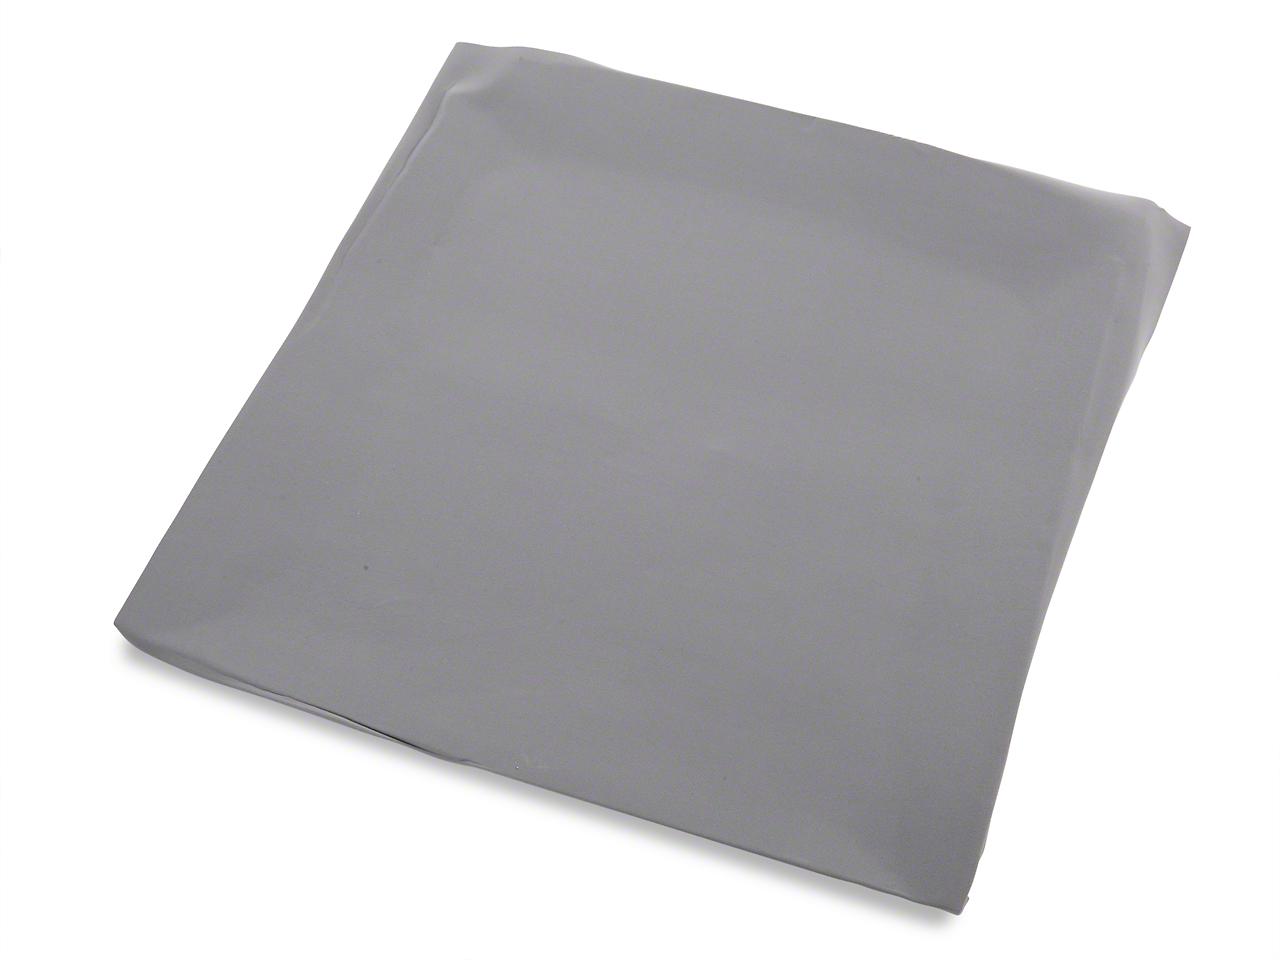 TMI Smoke Gray Cloth Headliner w/ Sunroof (87-89 Hatchback)